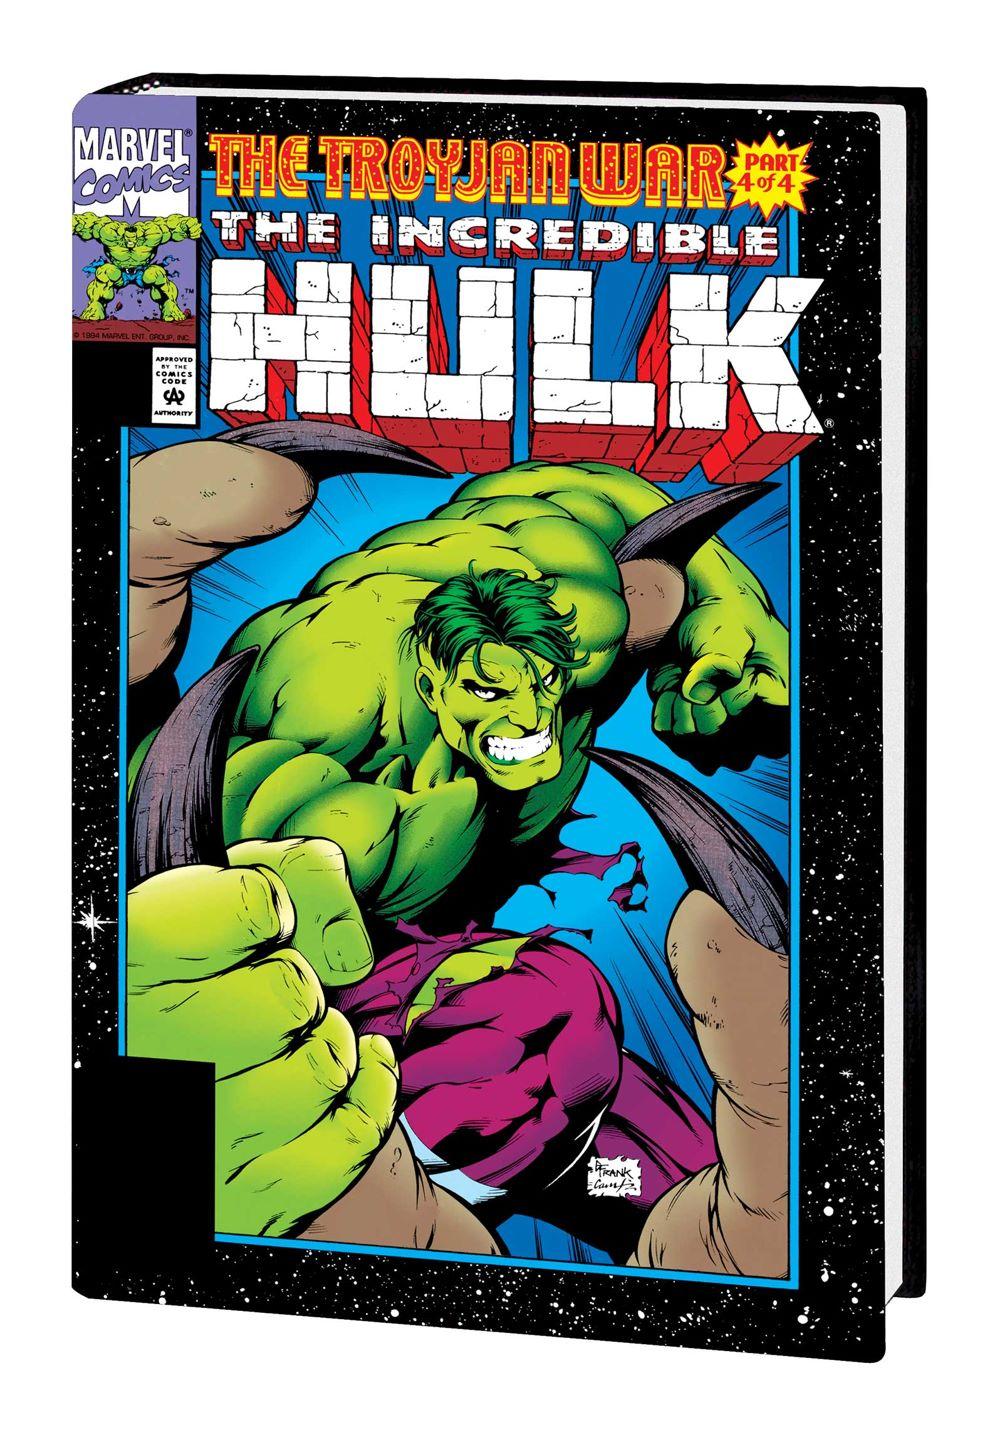 HULK_VOL_3_OMNIBUS_HC Marvel Comics January 2021 Solicitations